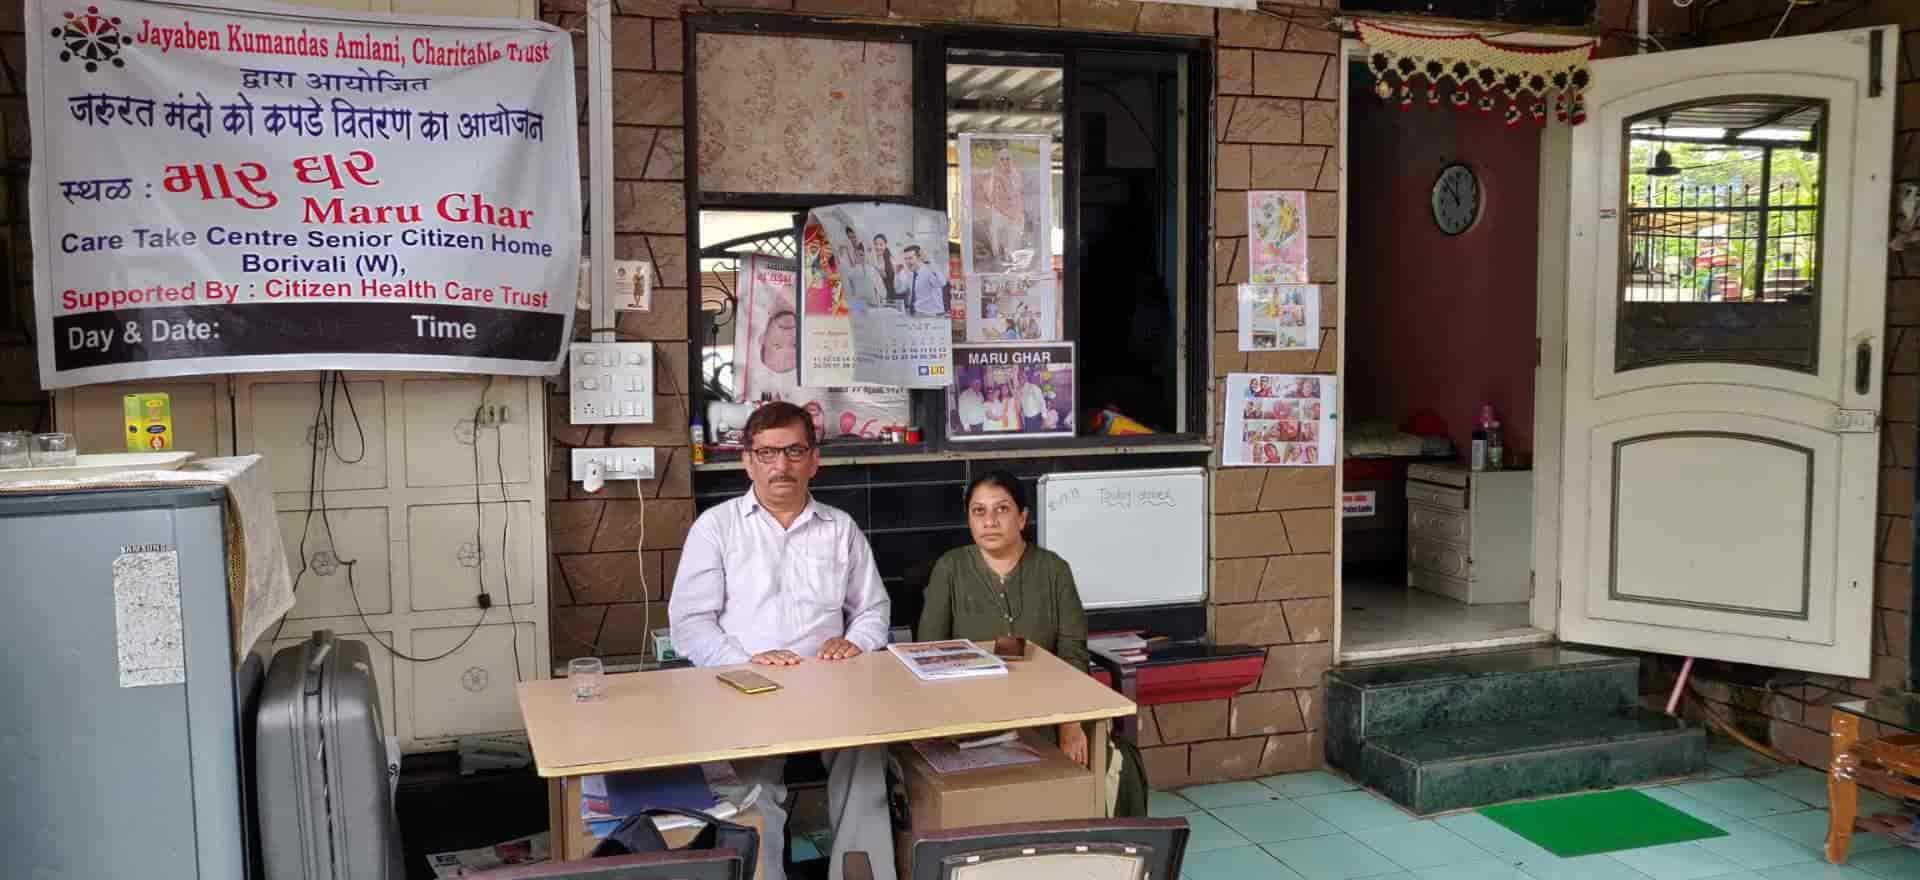 Dating Mumbai borivali